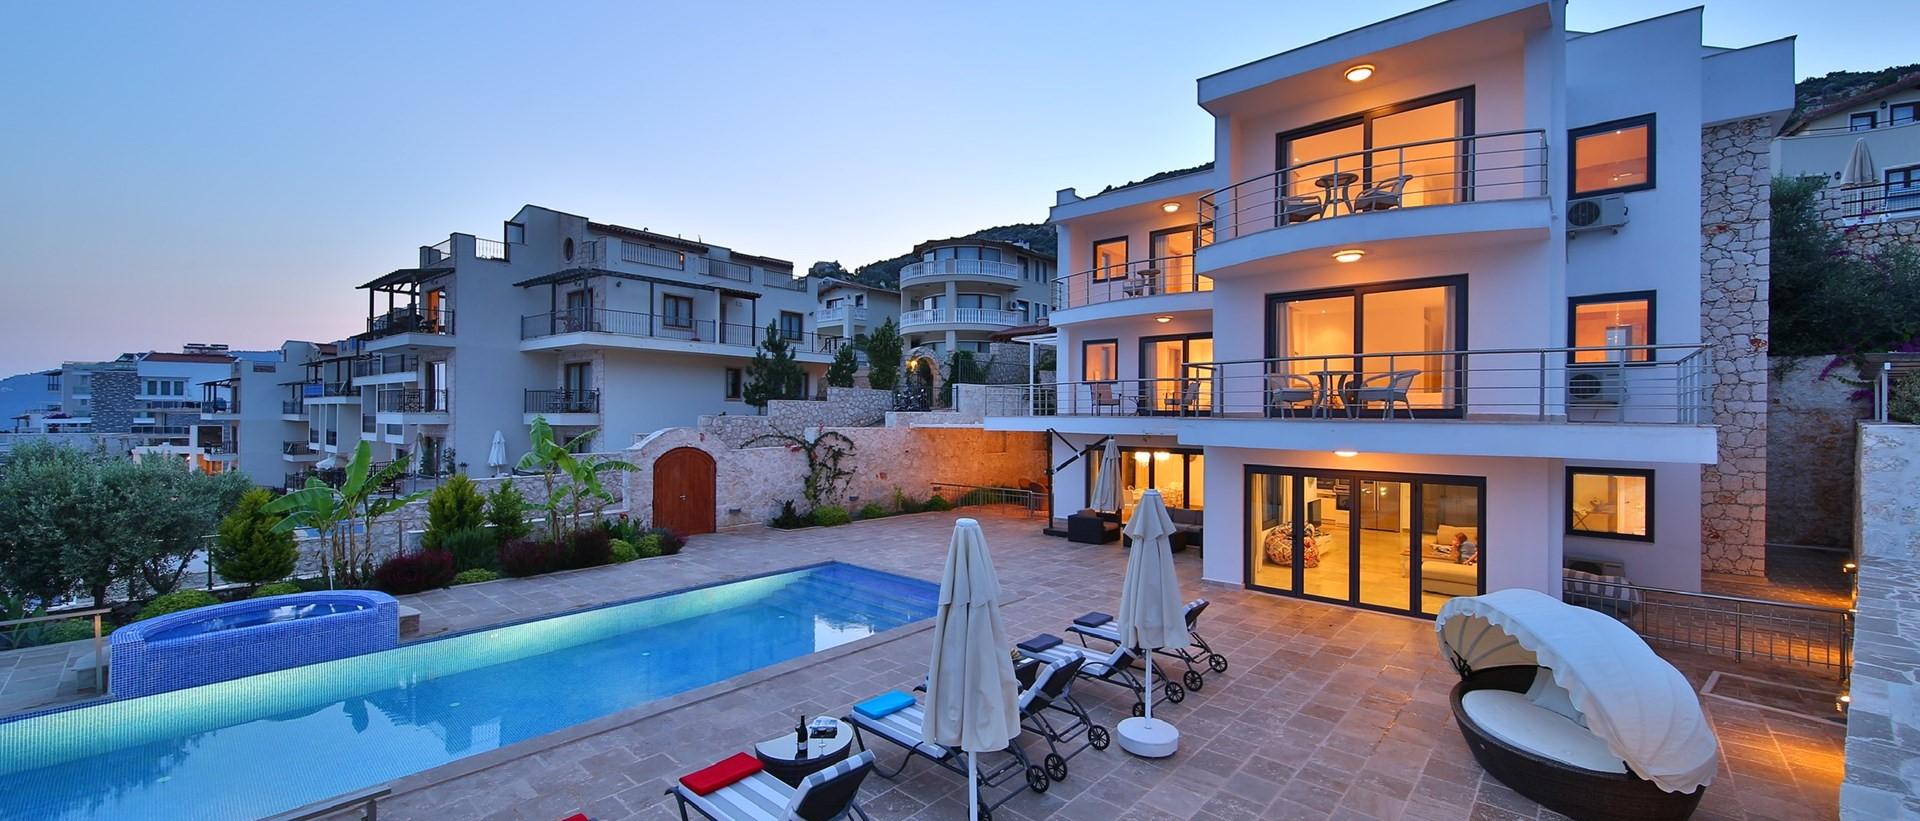 luxury-5-bedroom-family-pool-villa-kalka